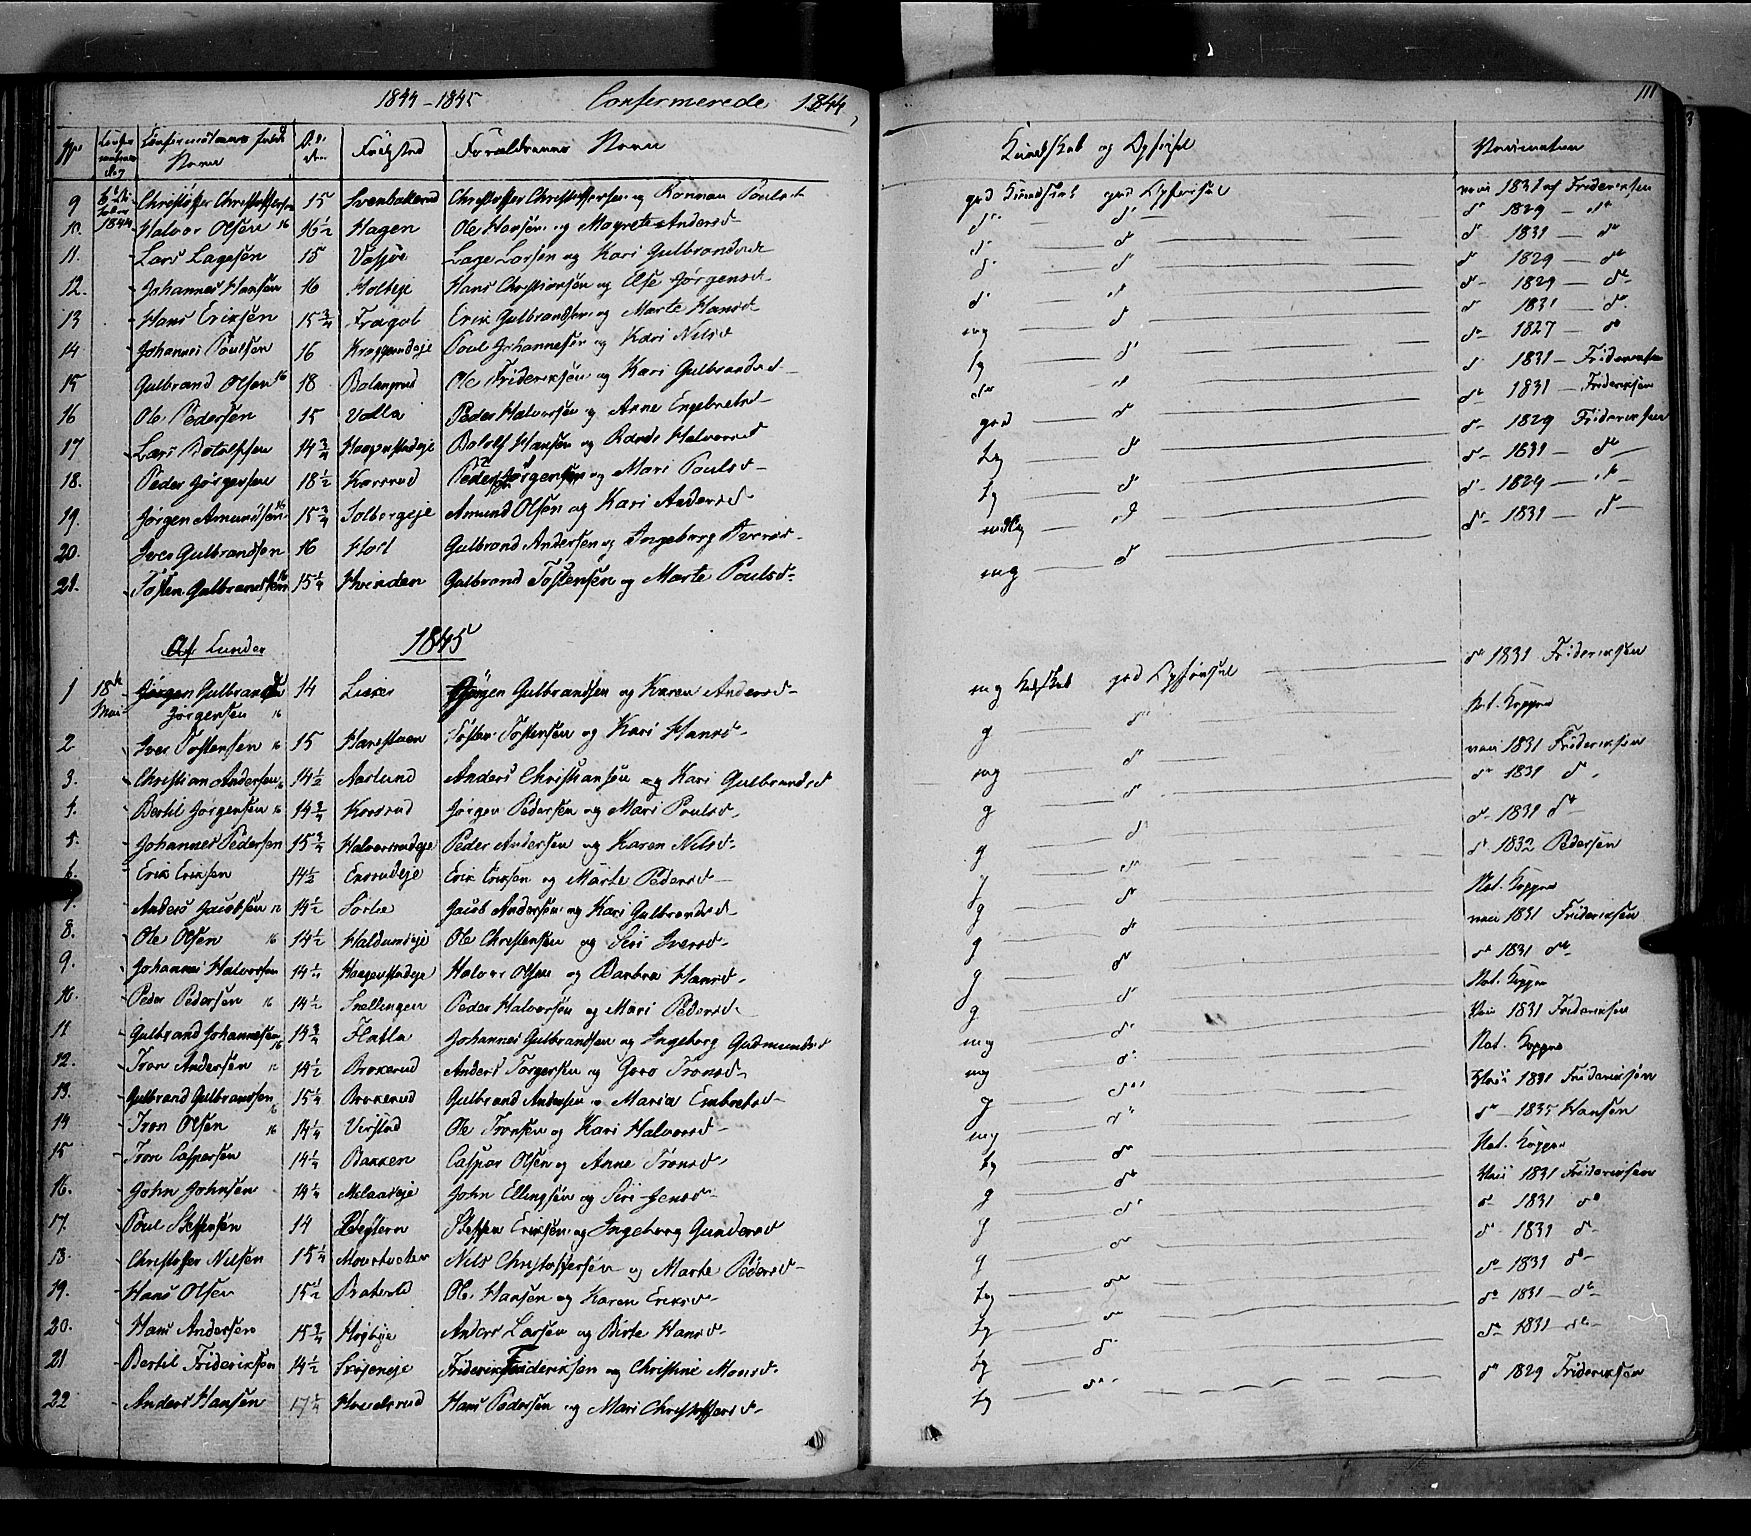 SAH, Jevnaker prestekontor, Ministerialbok nr. 6, 1837-1857, s. 111